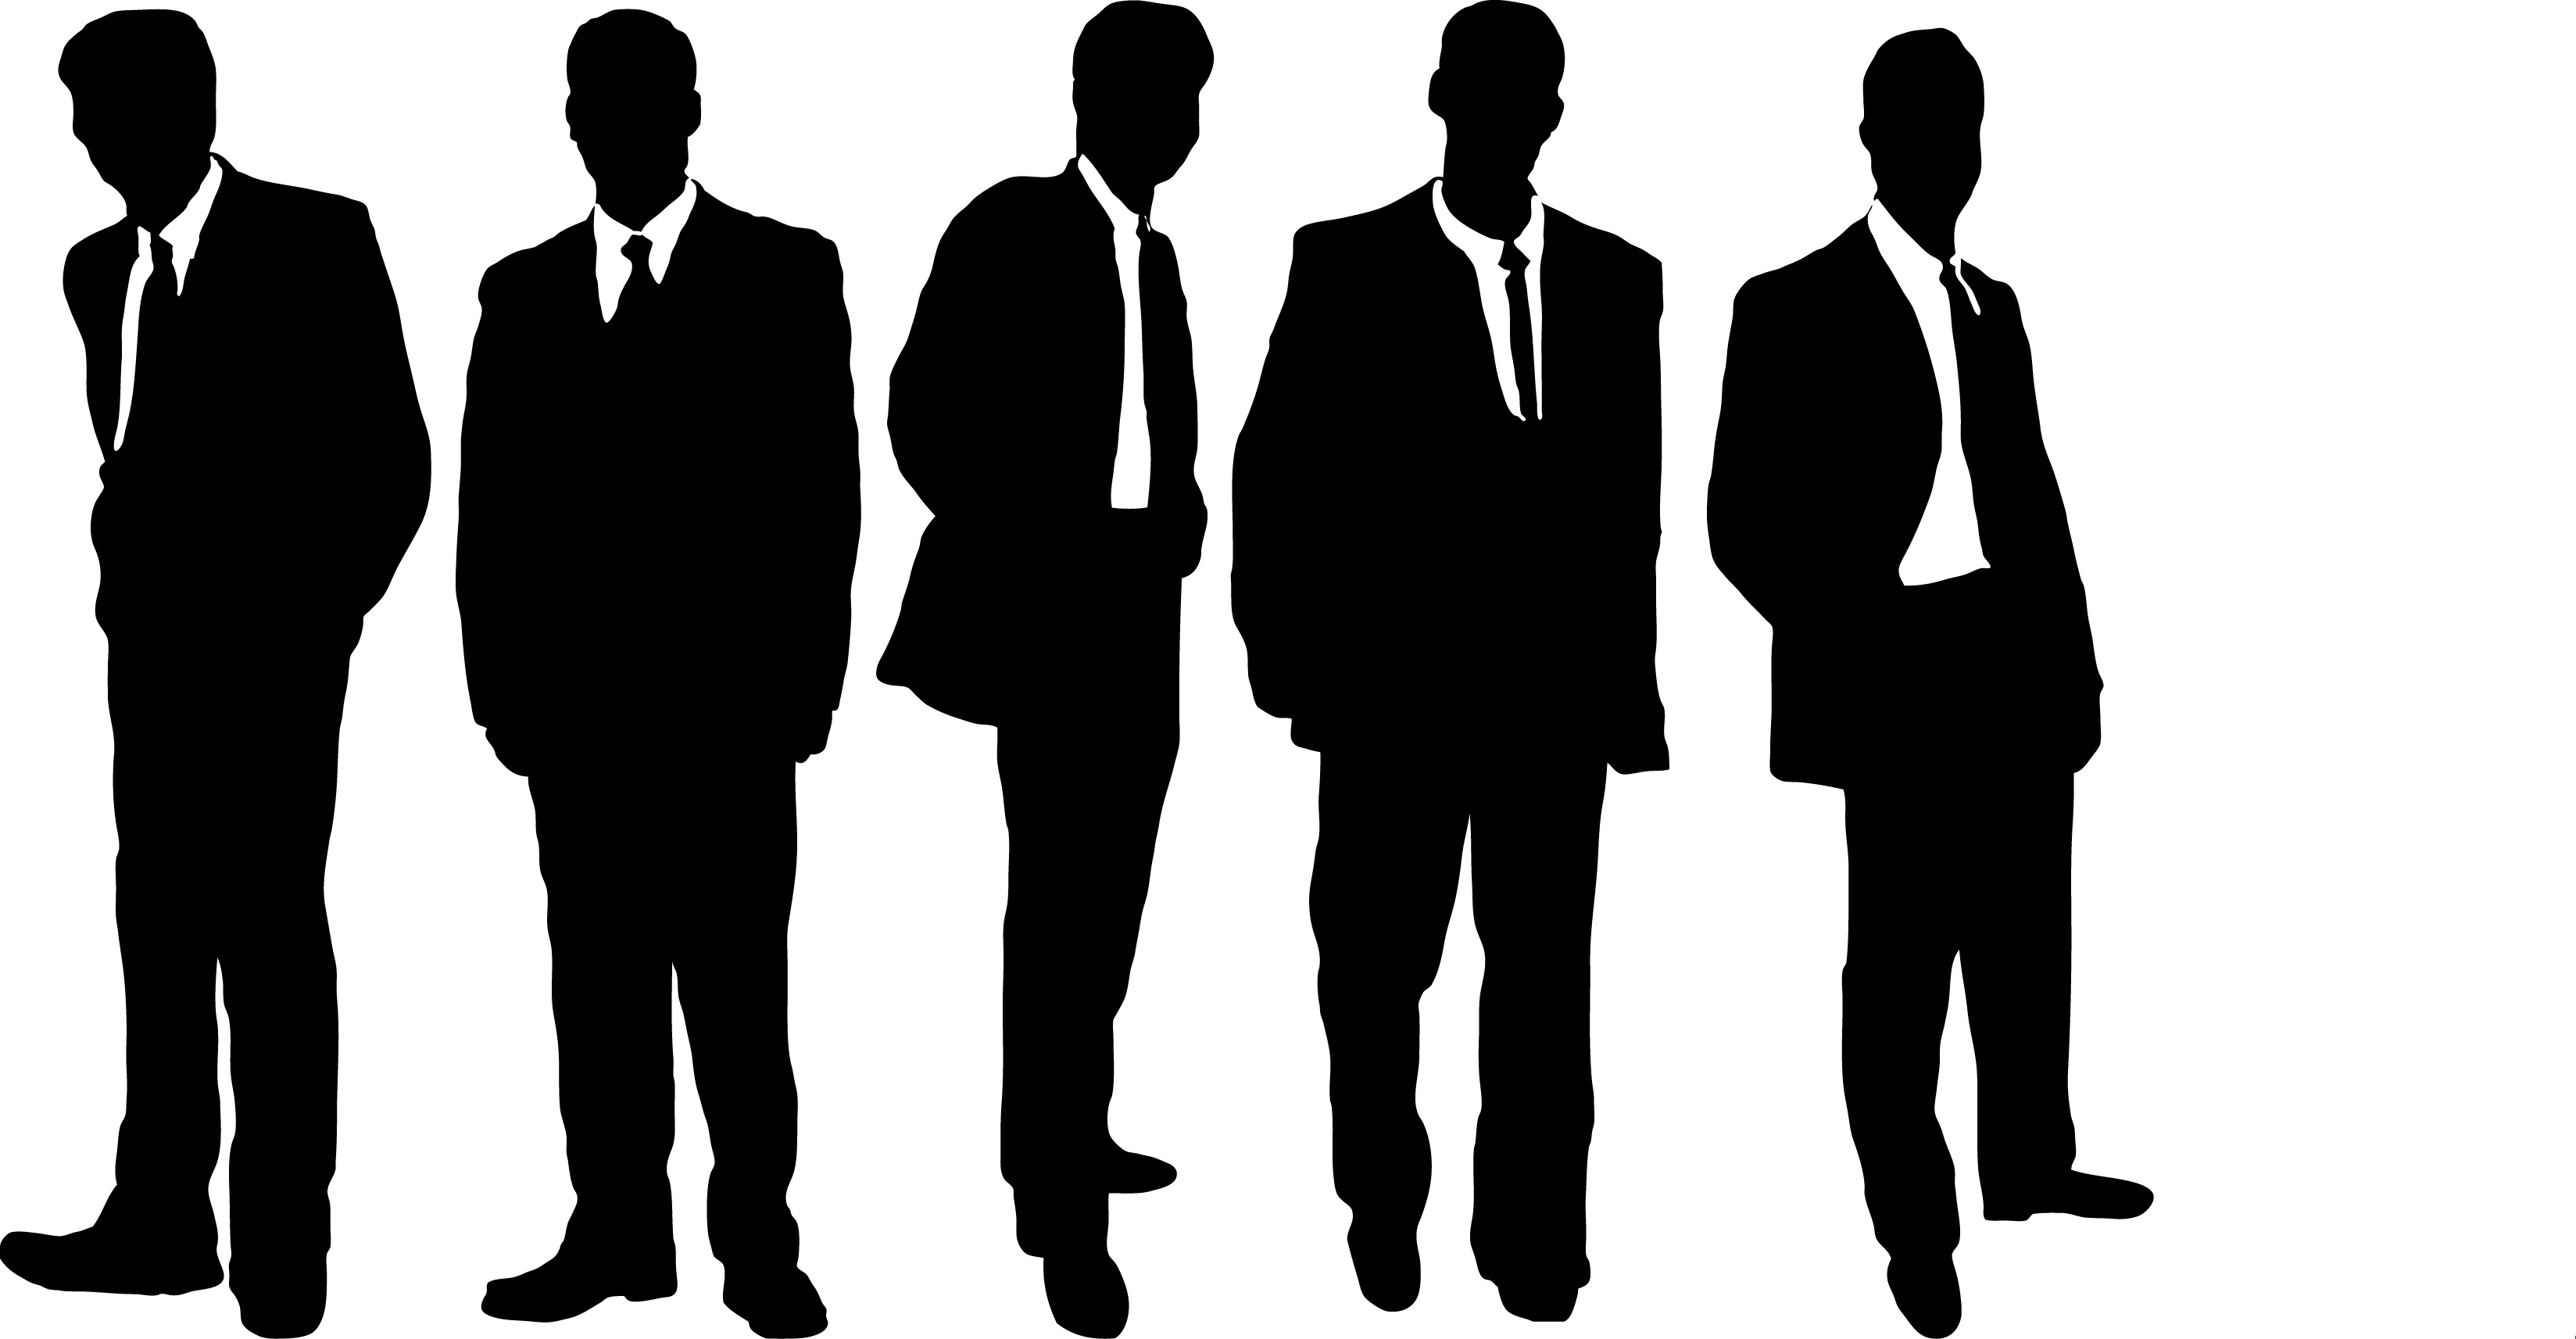 Clip Art Group Of Men Clipart#1986021.